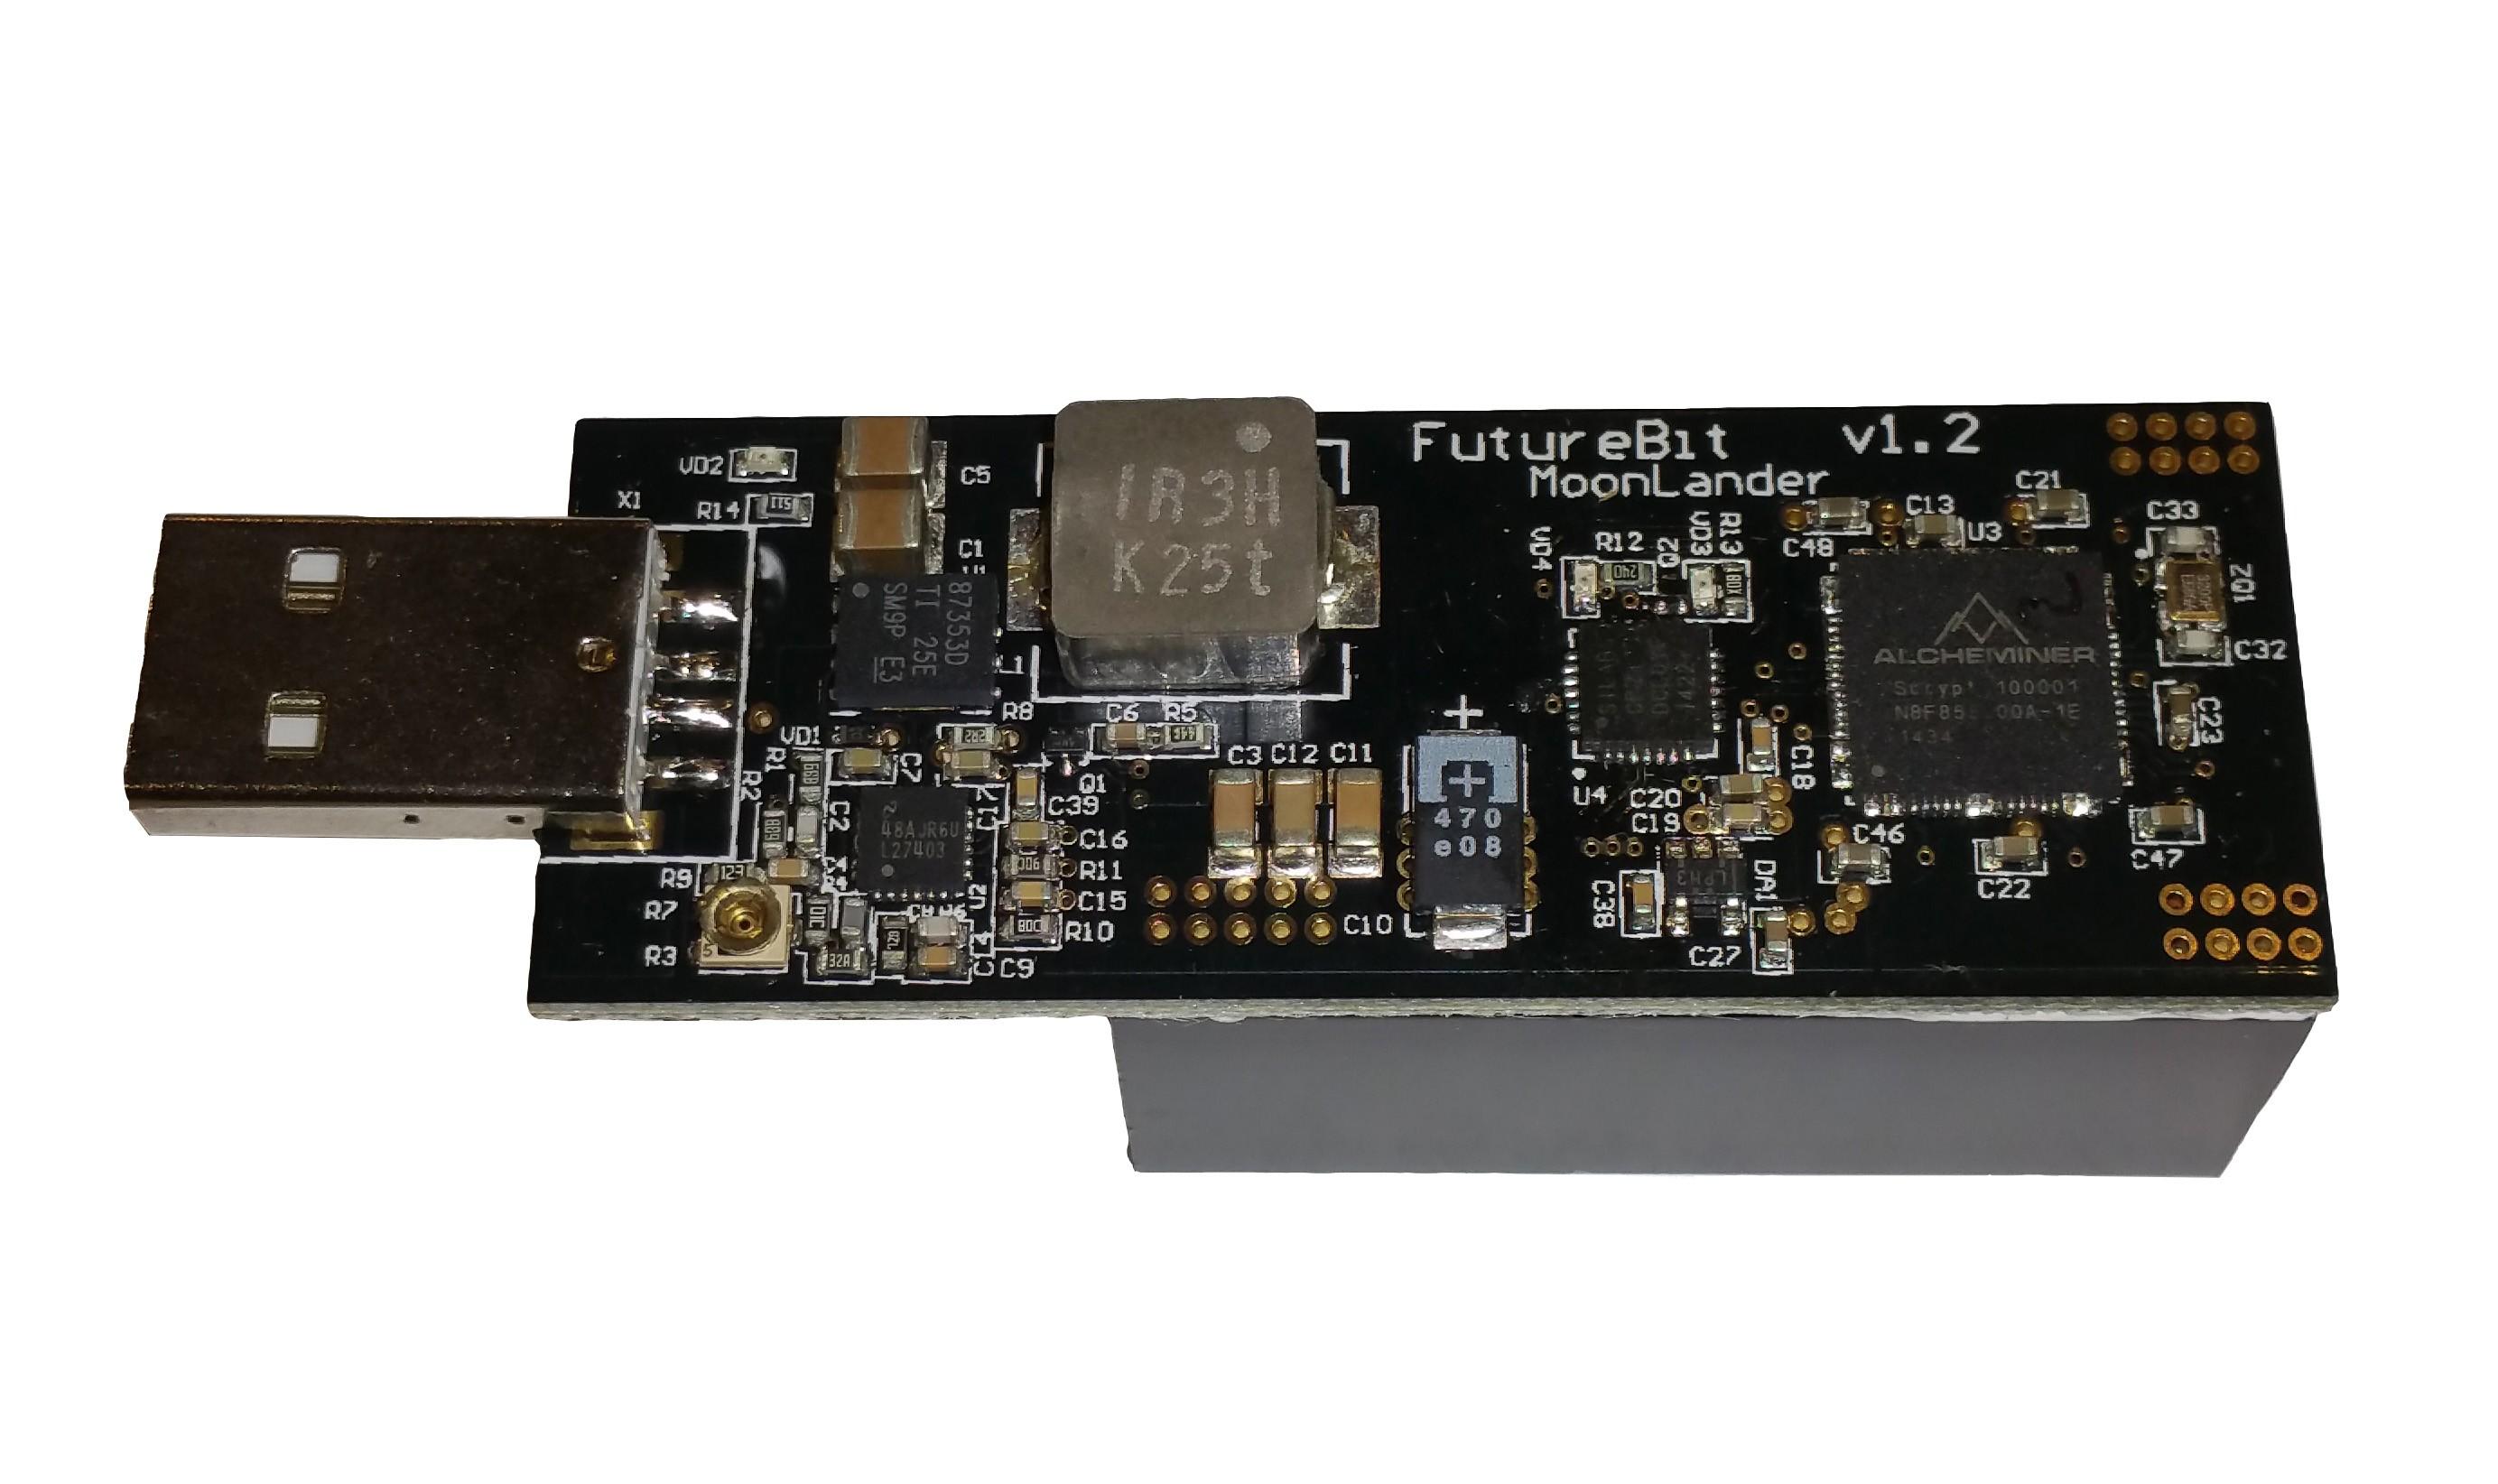 FutureBit Moonlander Scrypt Stickminer 300-1000kh/s - In Stock!